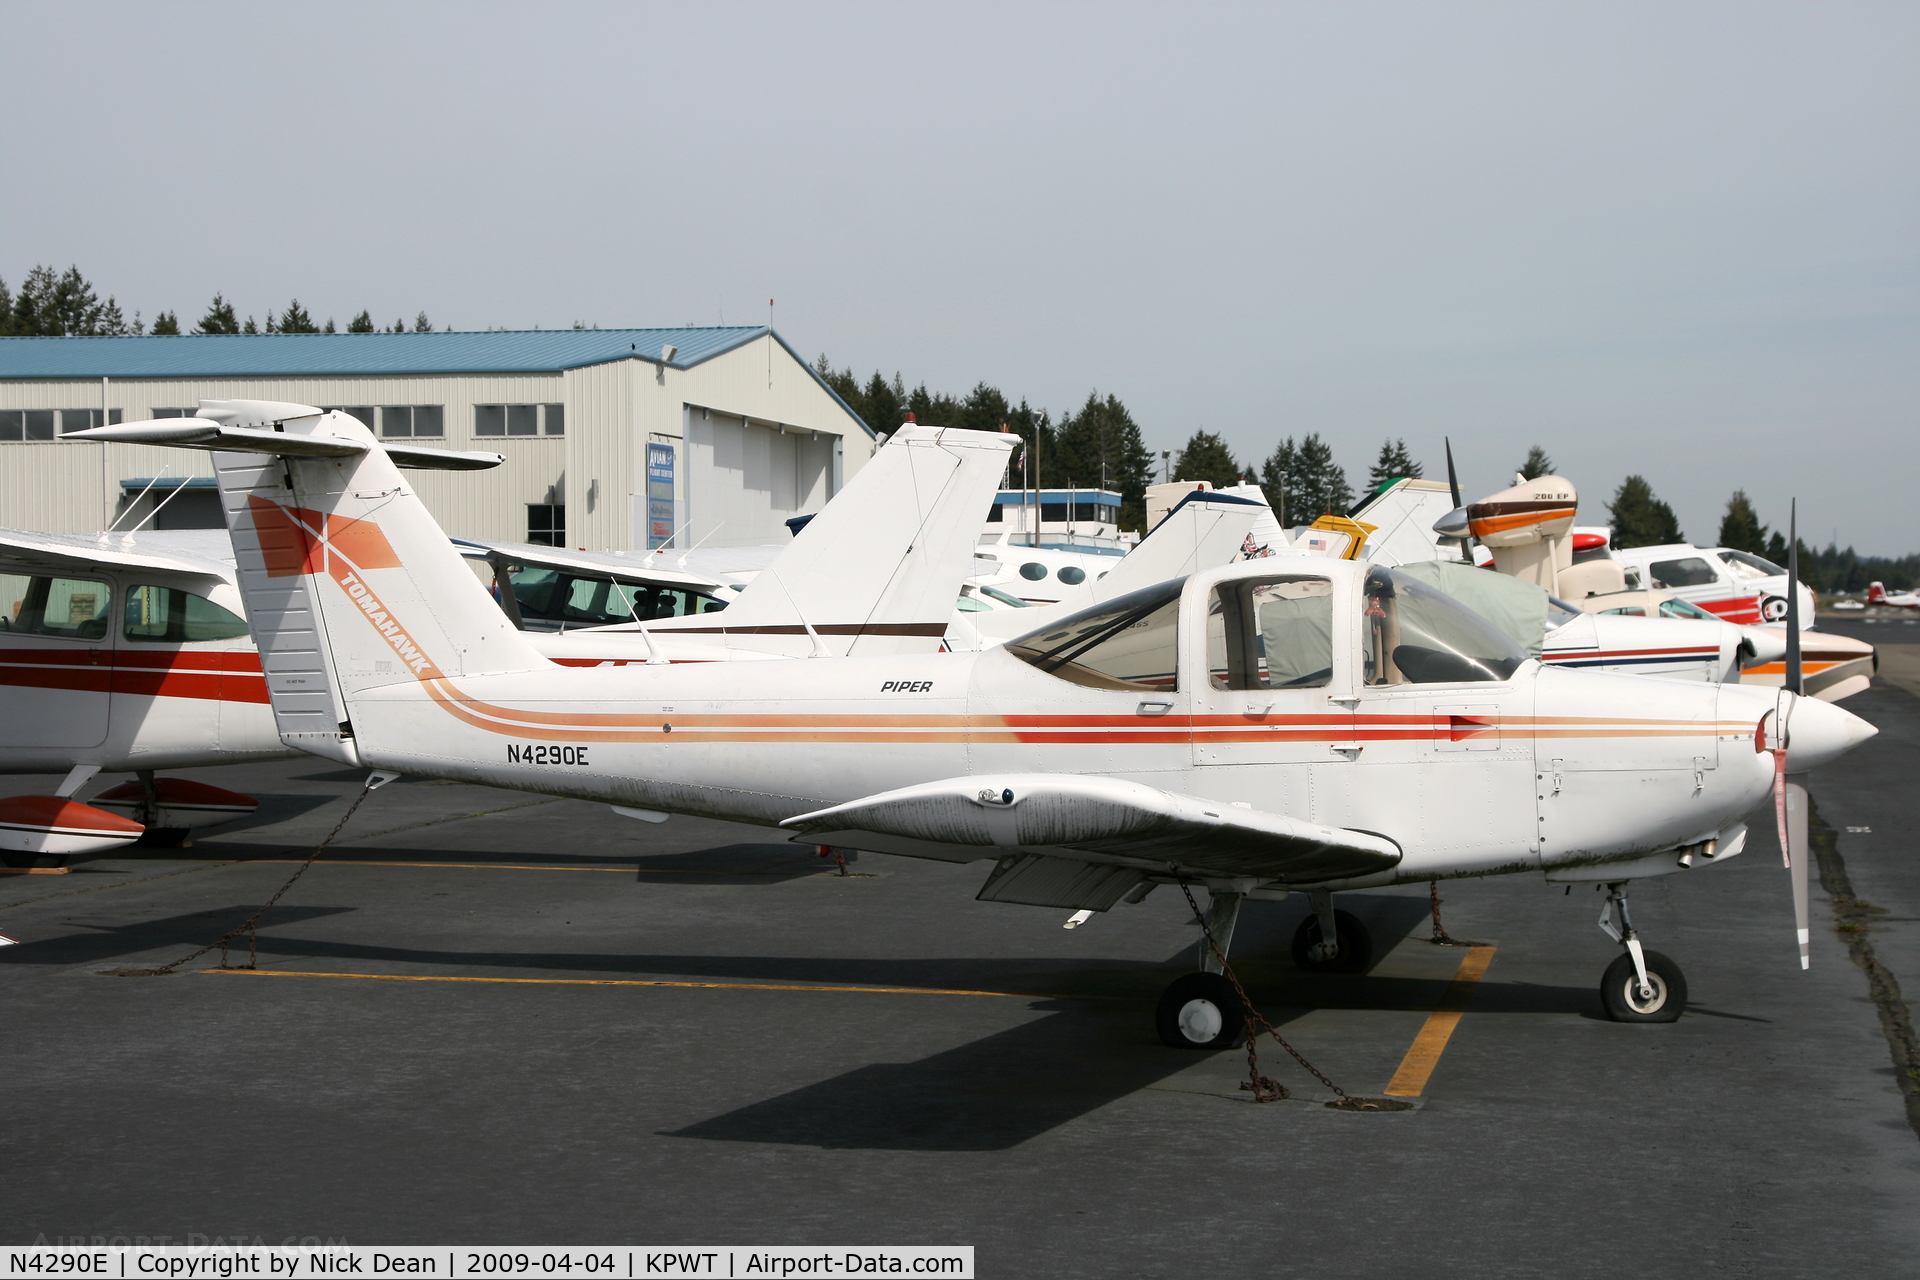 N4290E, 1978 Piper PA-38-112 Tomahawk C/N 38-78A0532, KPWT